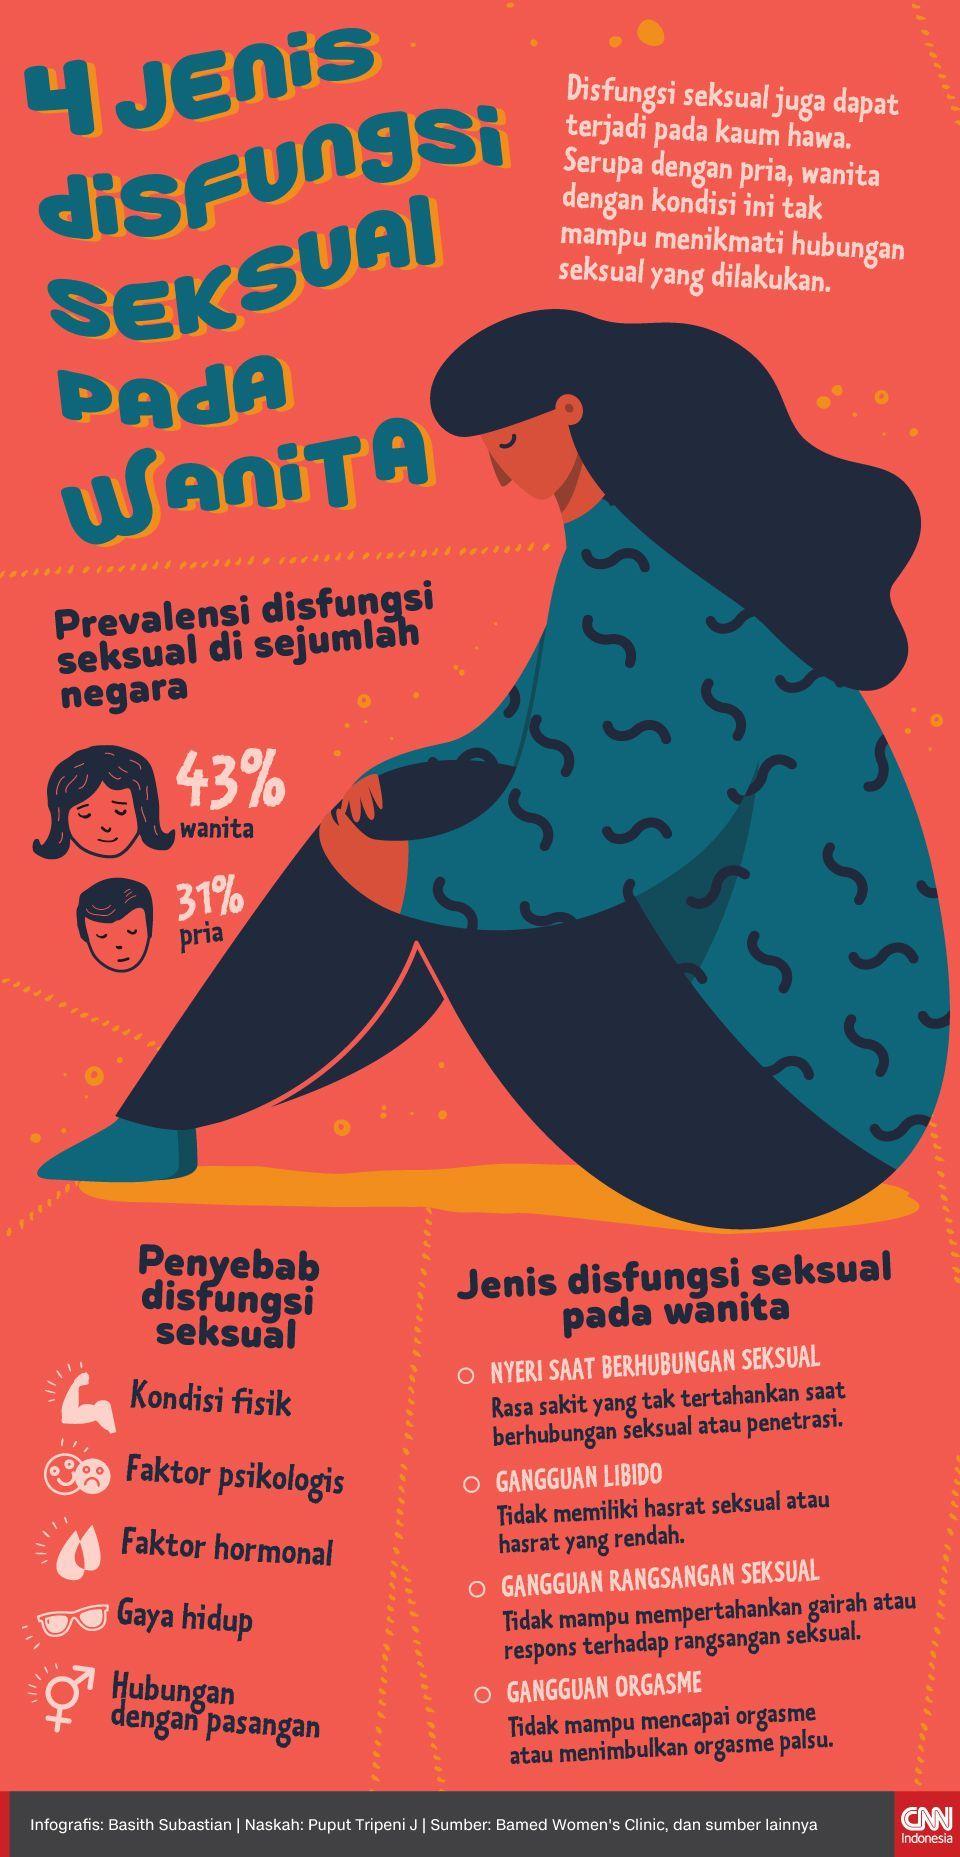 Infografis 4 Jenis Disfungsi Seksual pada Wanita